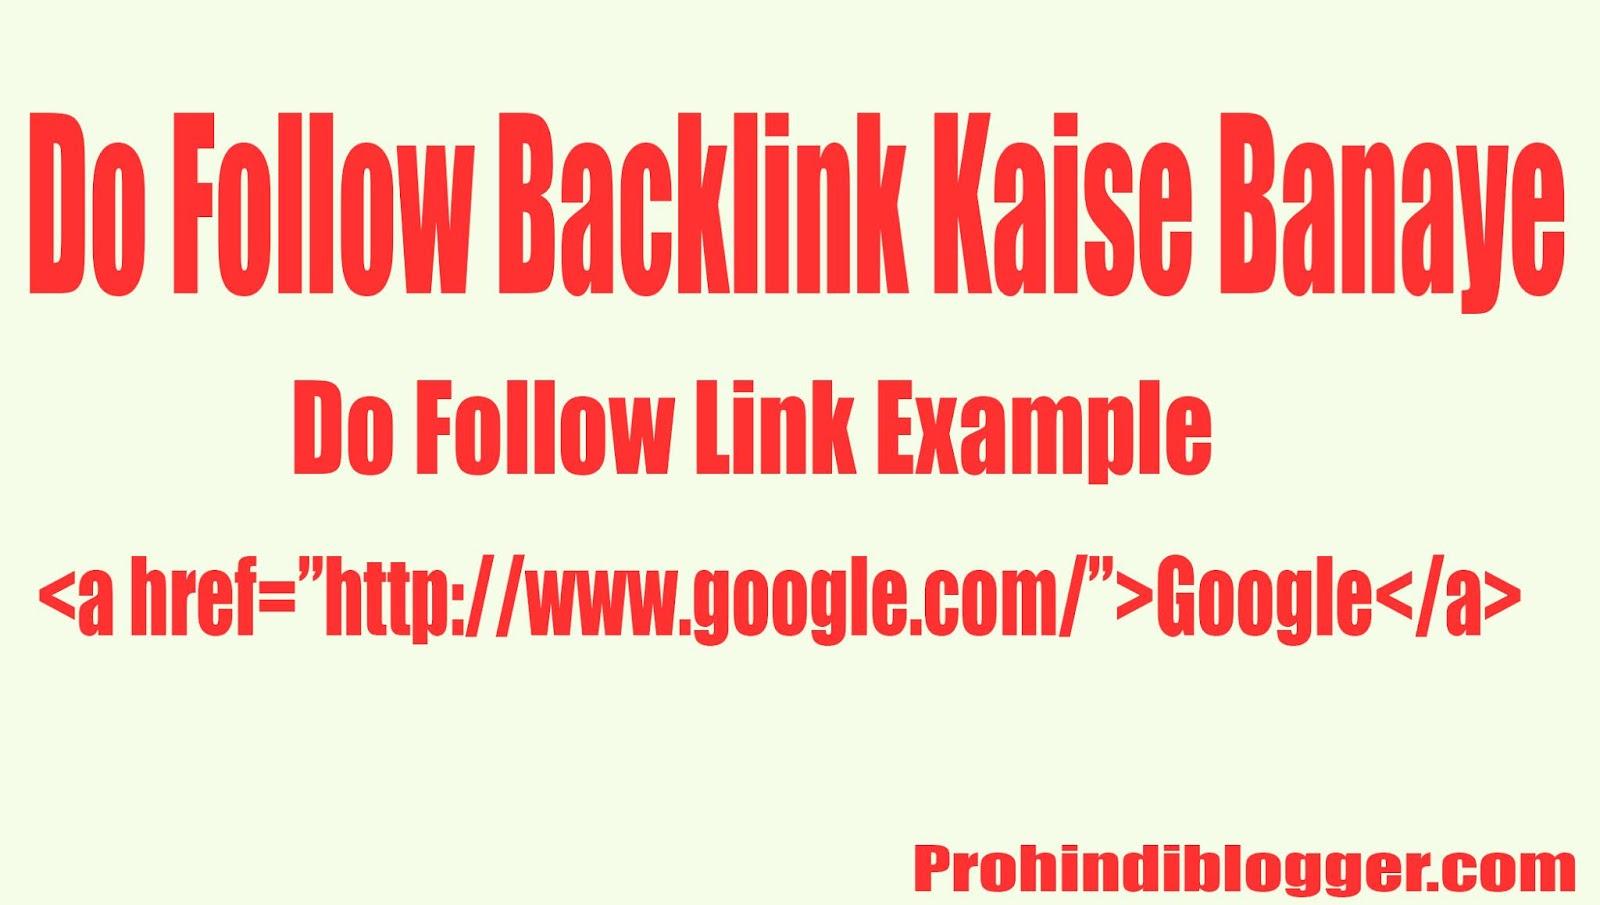 do follow backlink kaise banaye, backlink, link building in hindi